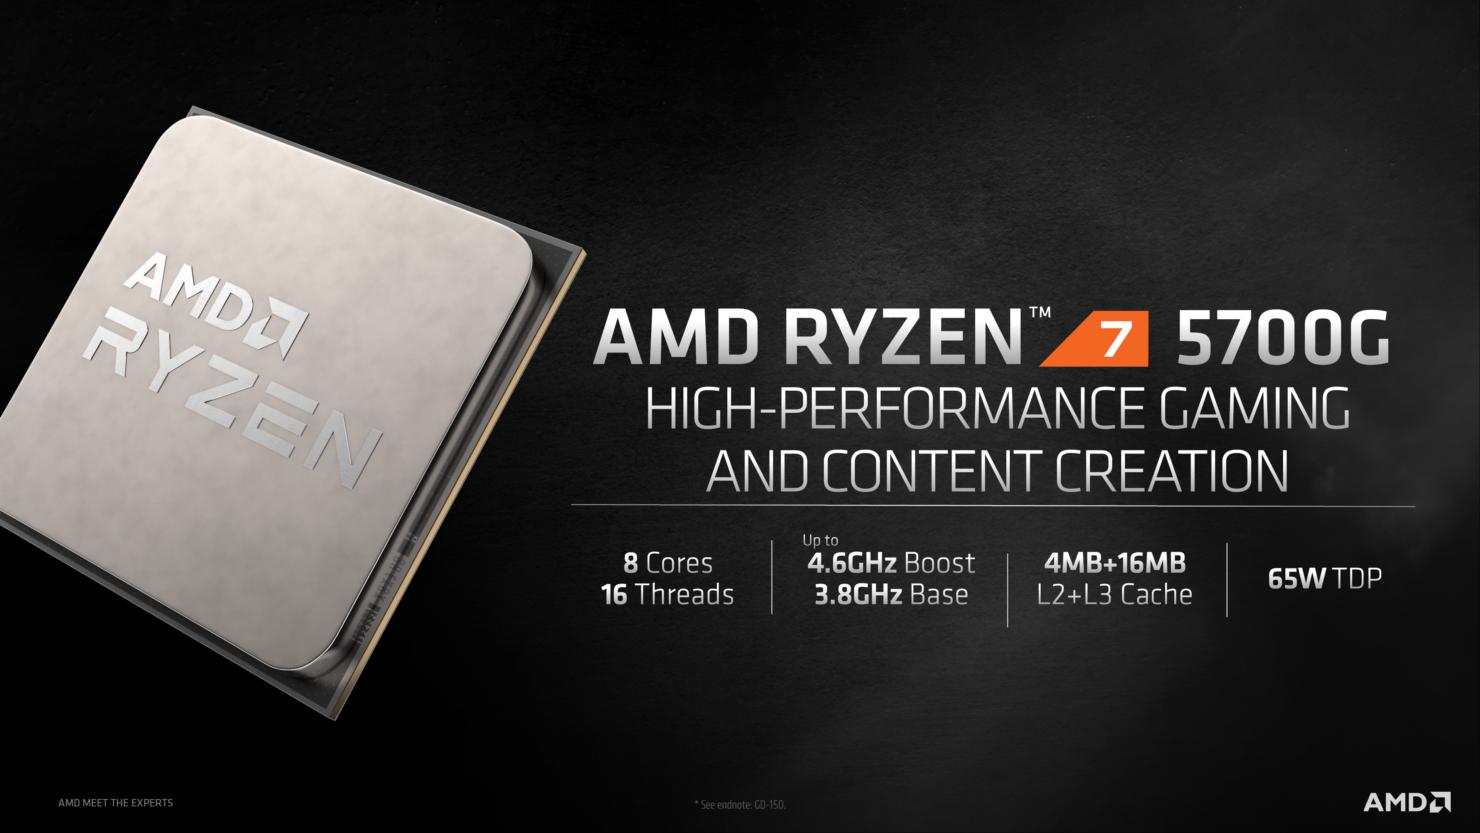 amd-ryzen-5000g-desktop-apus-launch-_-ryzen-7-5700g-ryzen-5-5600g-_6